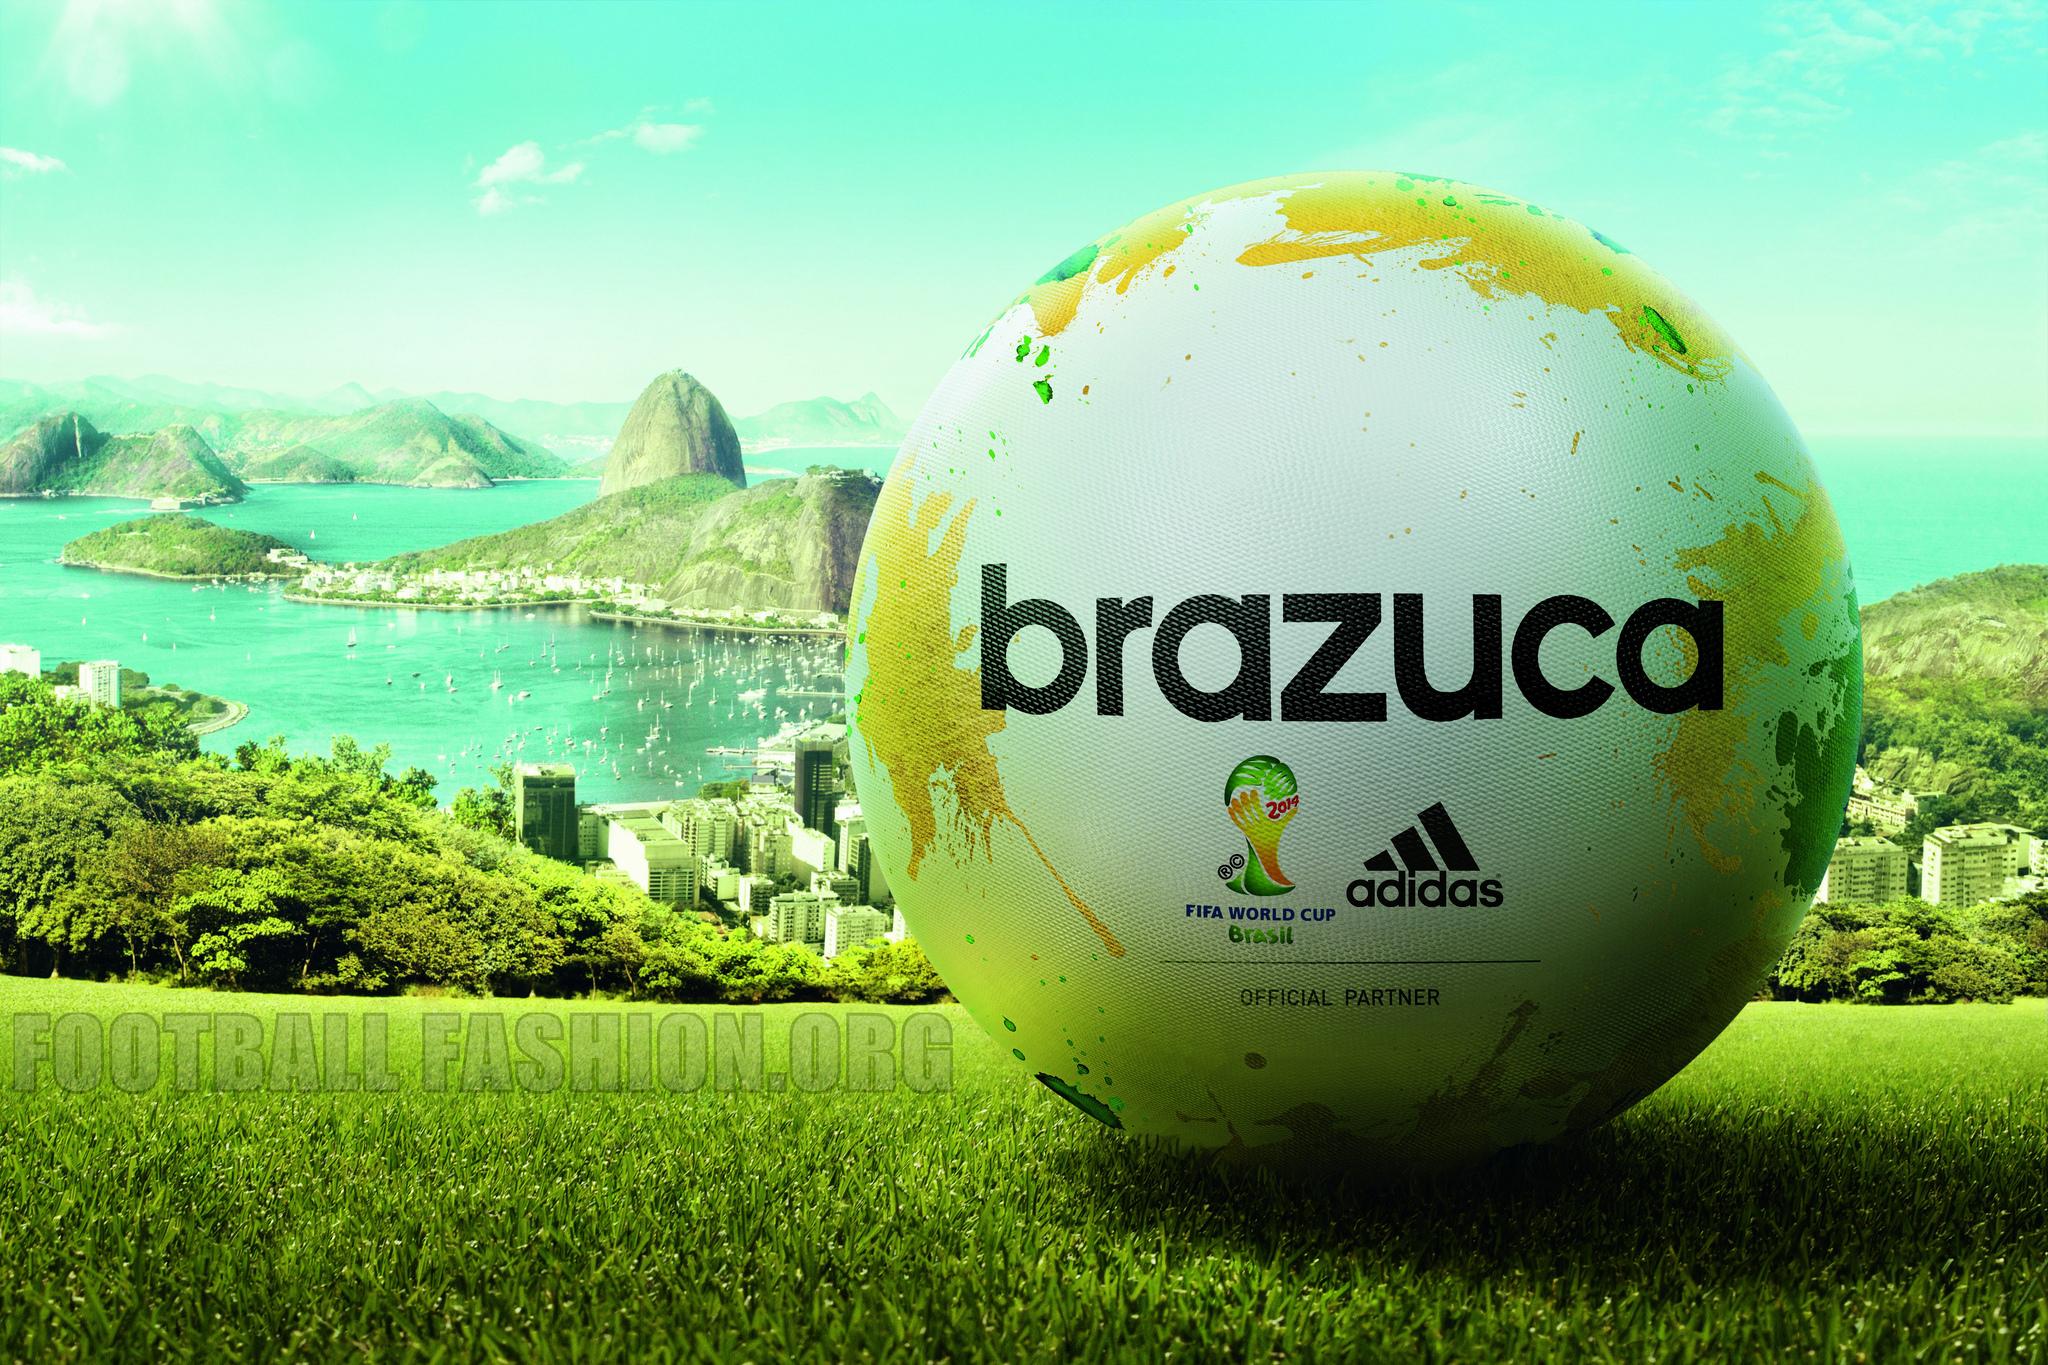 _FIFA_World_Cup_2014_Ball_043766_